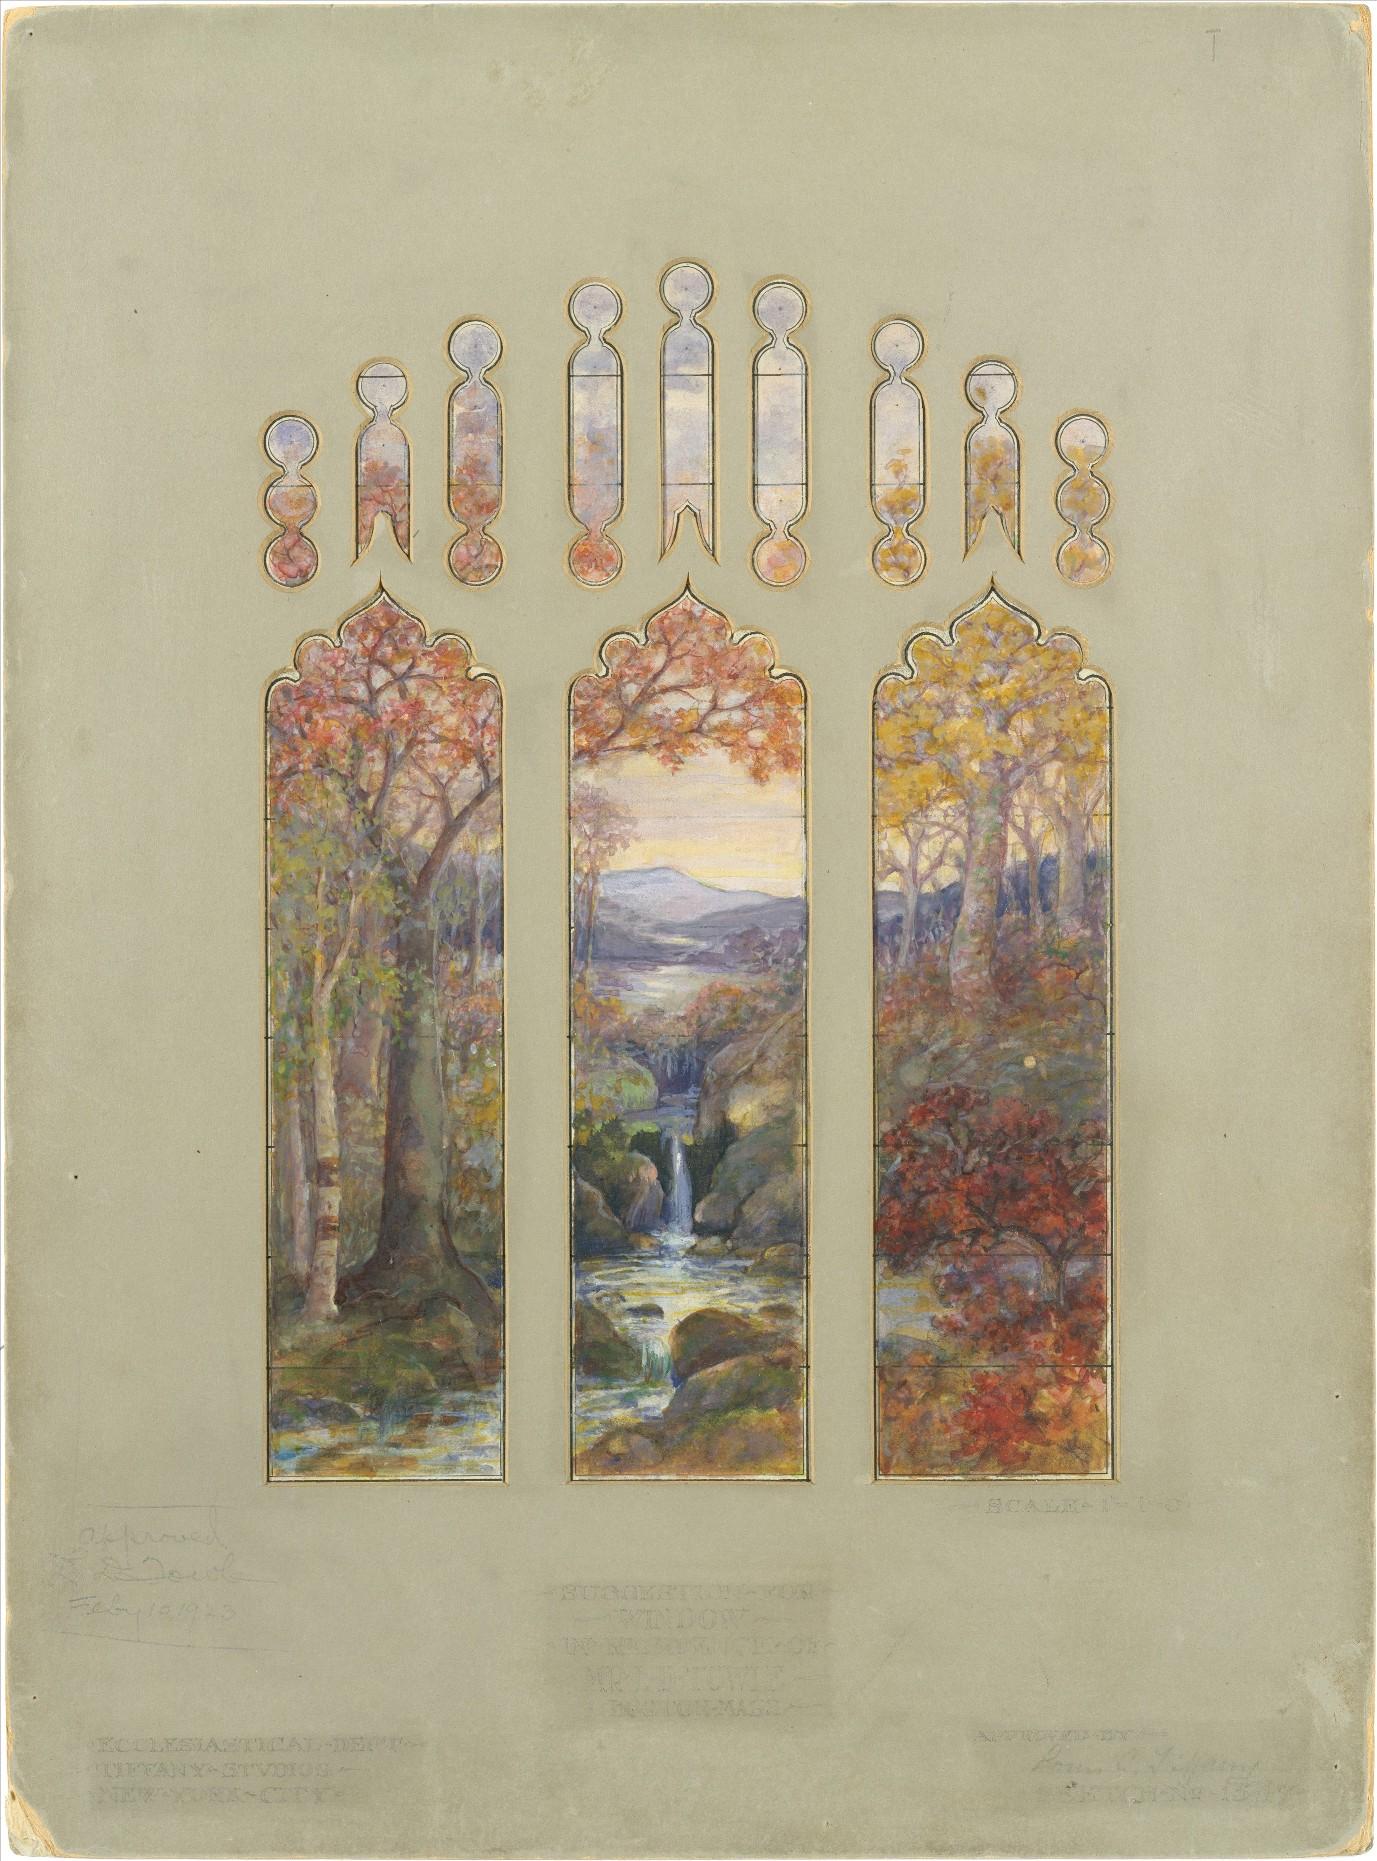 """ Art, Biology, and Conservation: Biodetermination of Works of Art ""; Luis Comfort Tiffany, ""Design for Autumn Landscape window"", 1923"